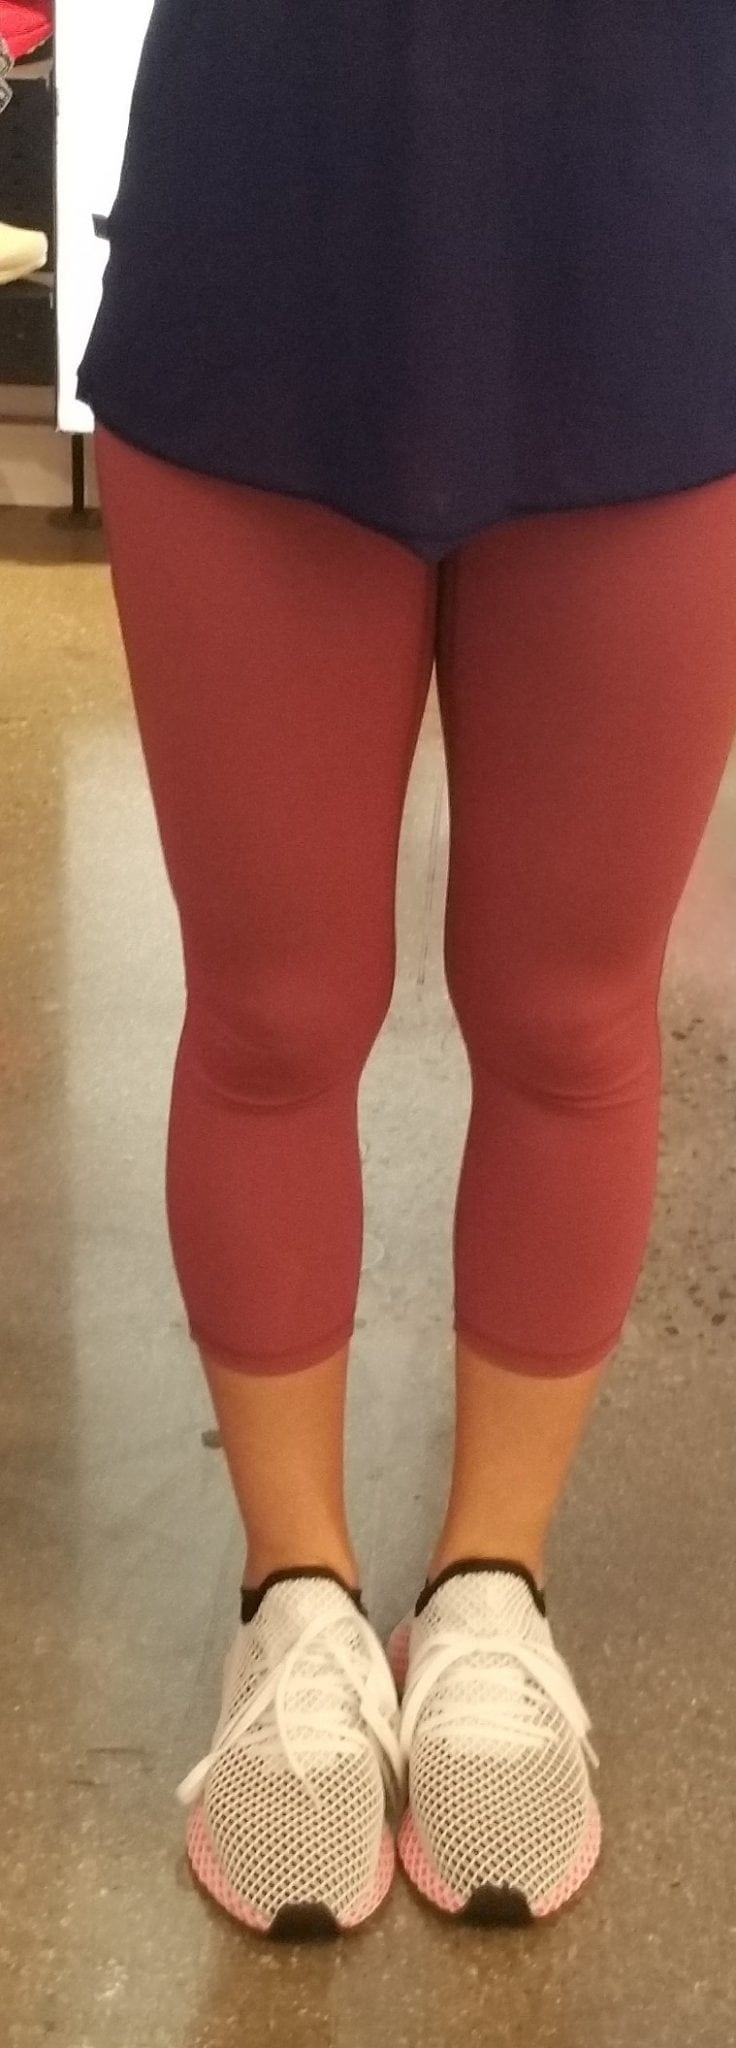 Adidas Deerupt Runner Shoes in Core Black/Chalk Pink